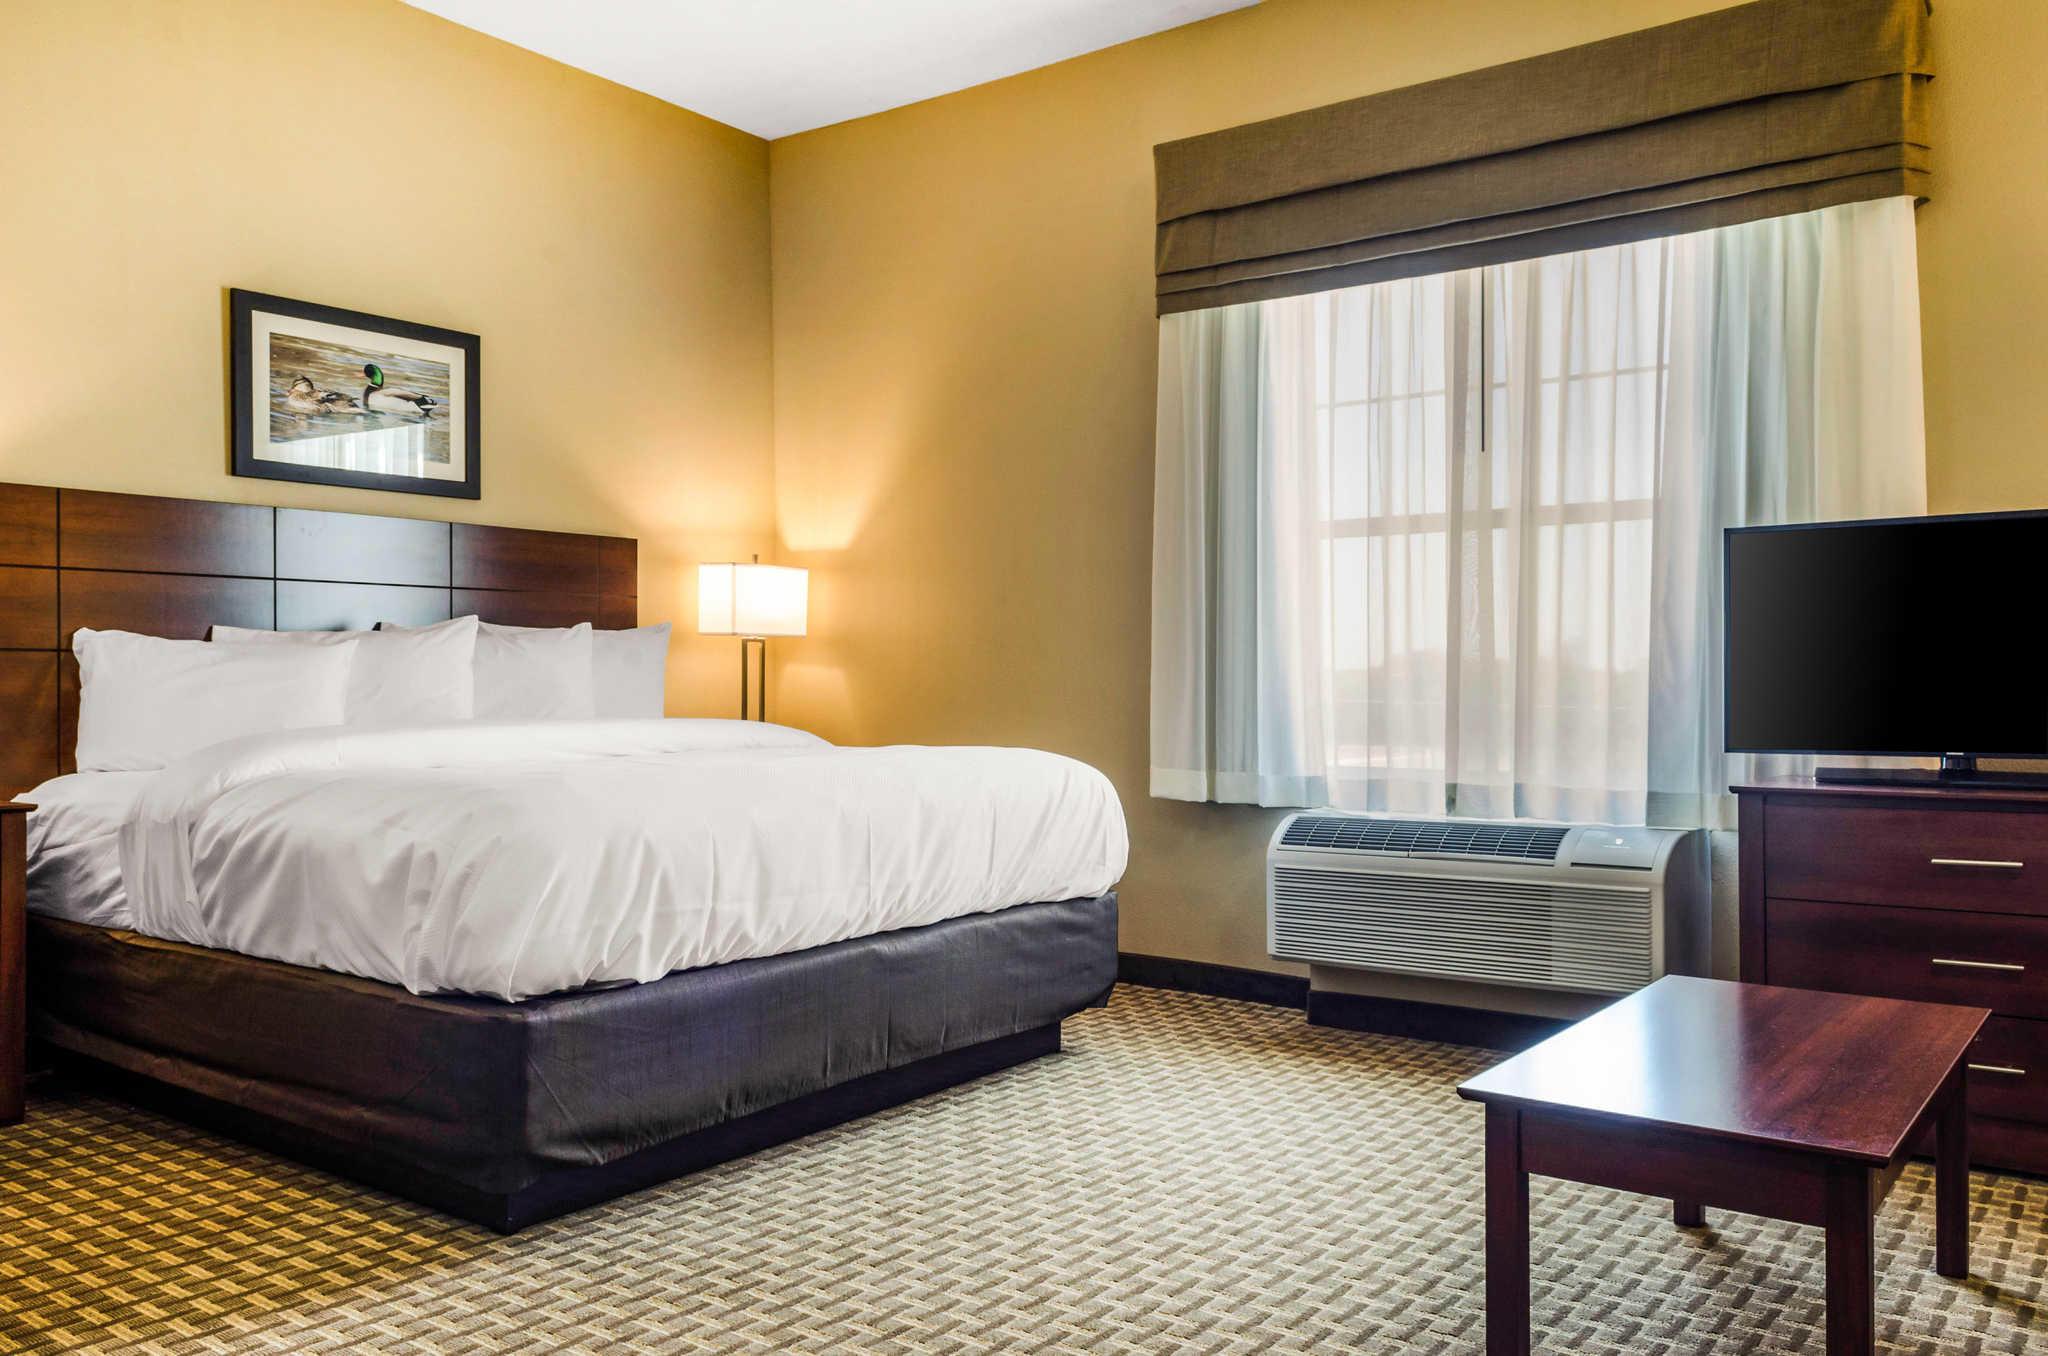 MainStay Suites Hackberry Sportsman's Lodge image 15